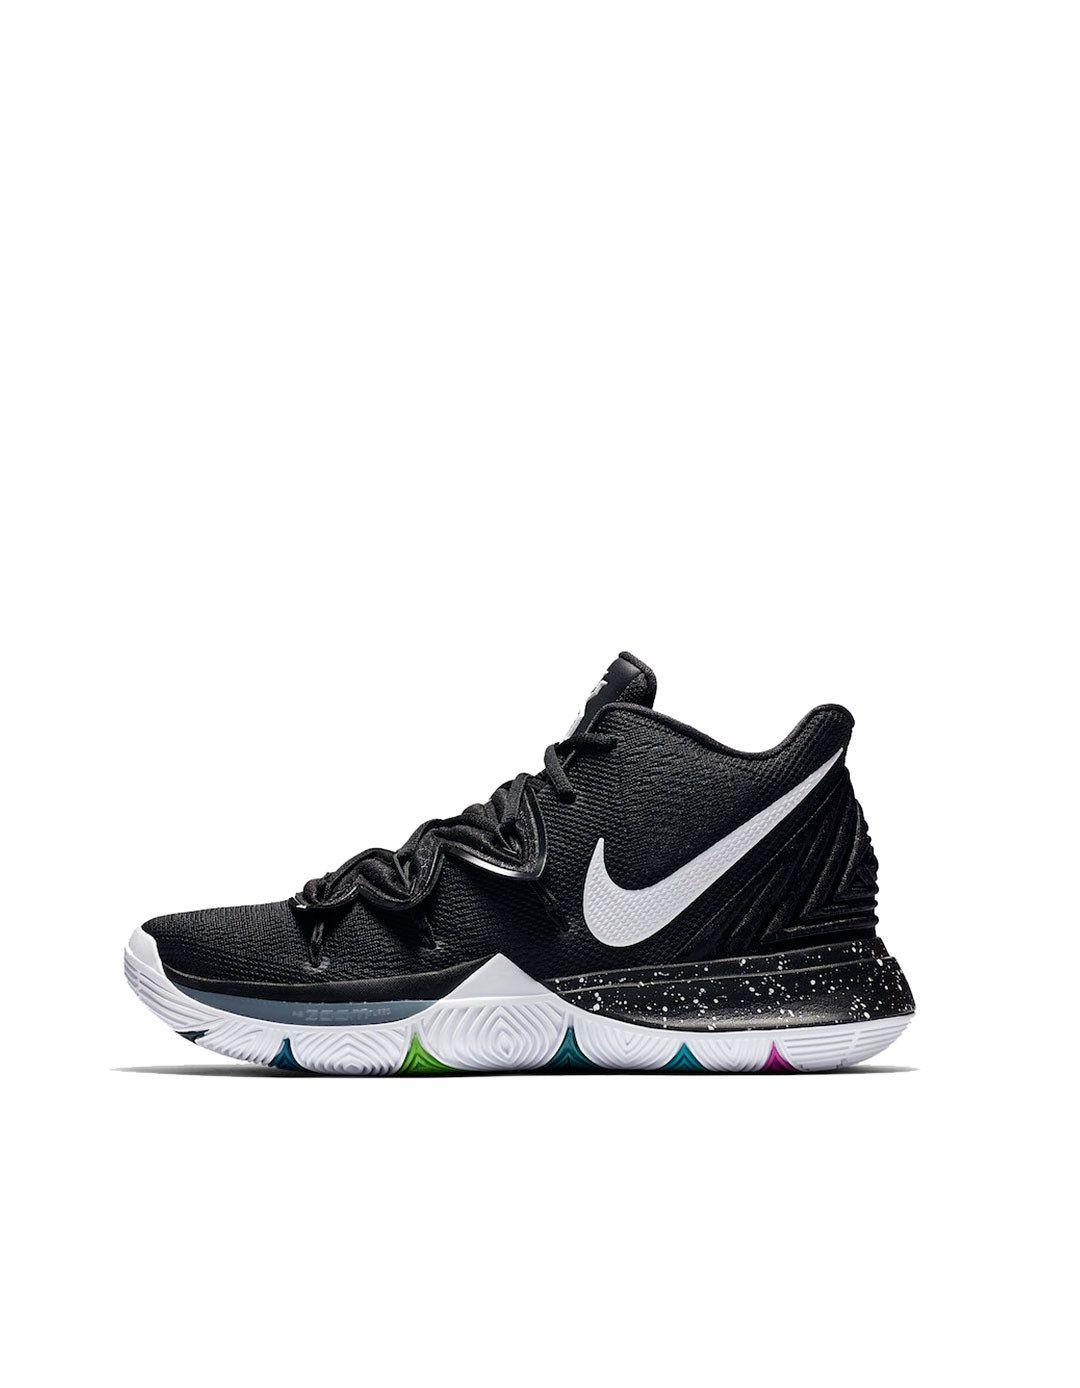 premium selection f564f 97258 Nike Kyrie 5